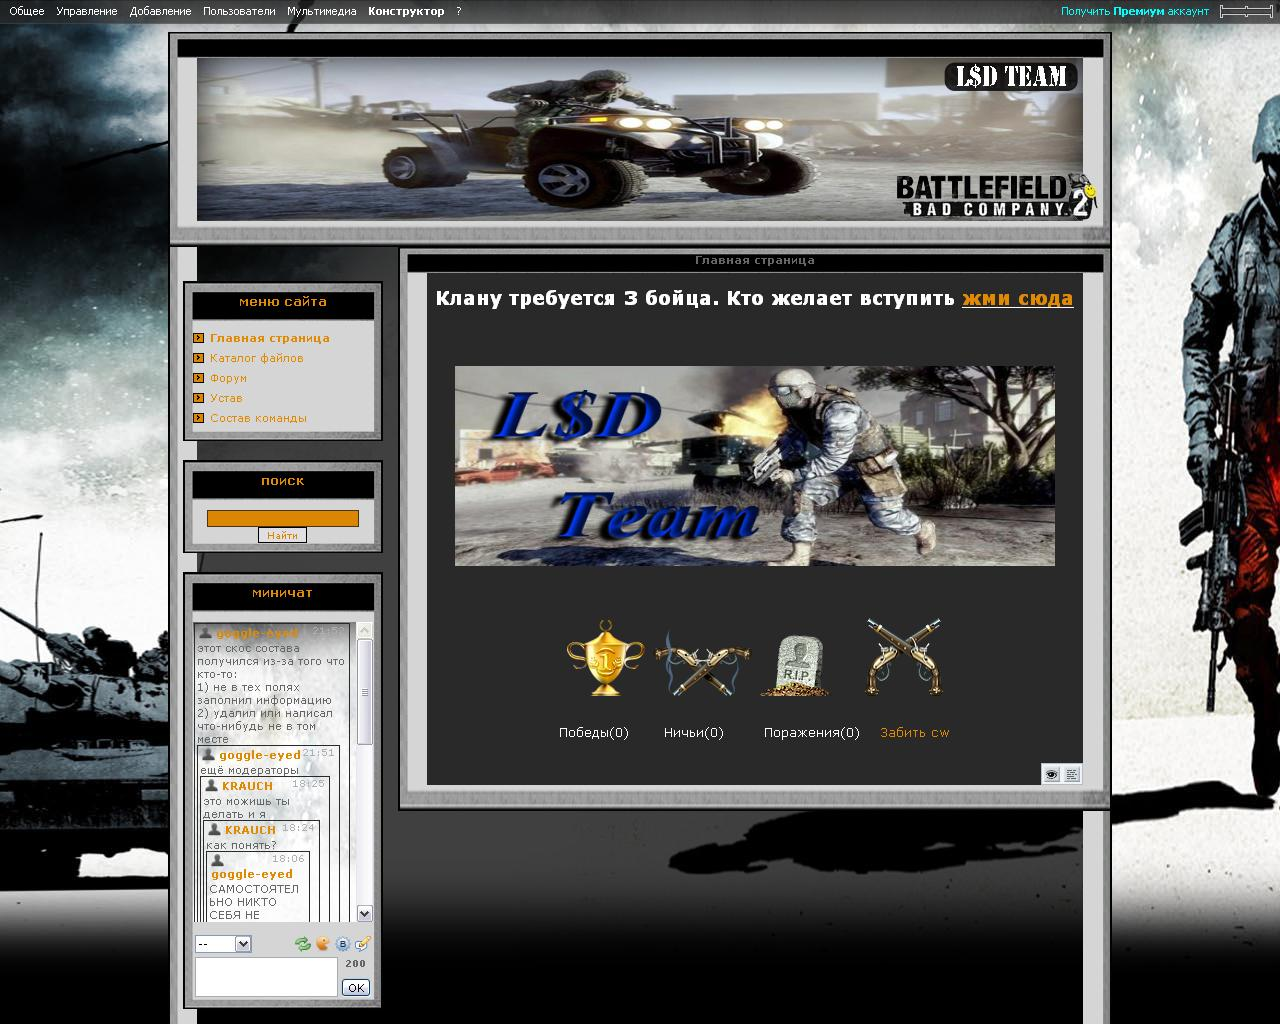 Шаблон Battlefield bad company 2 для ucoz